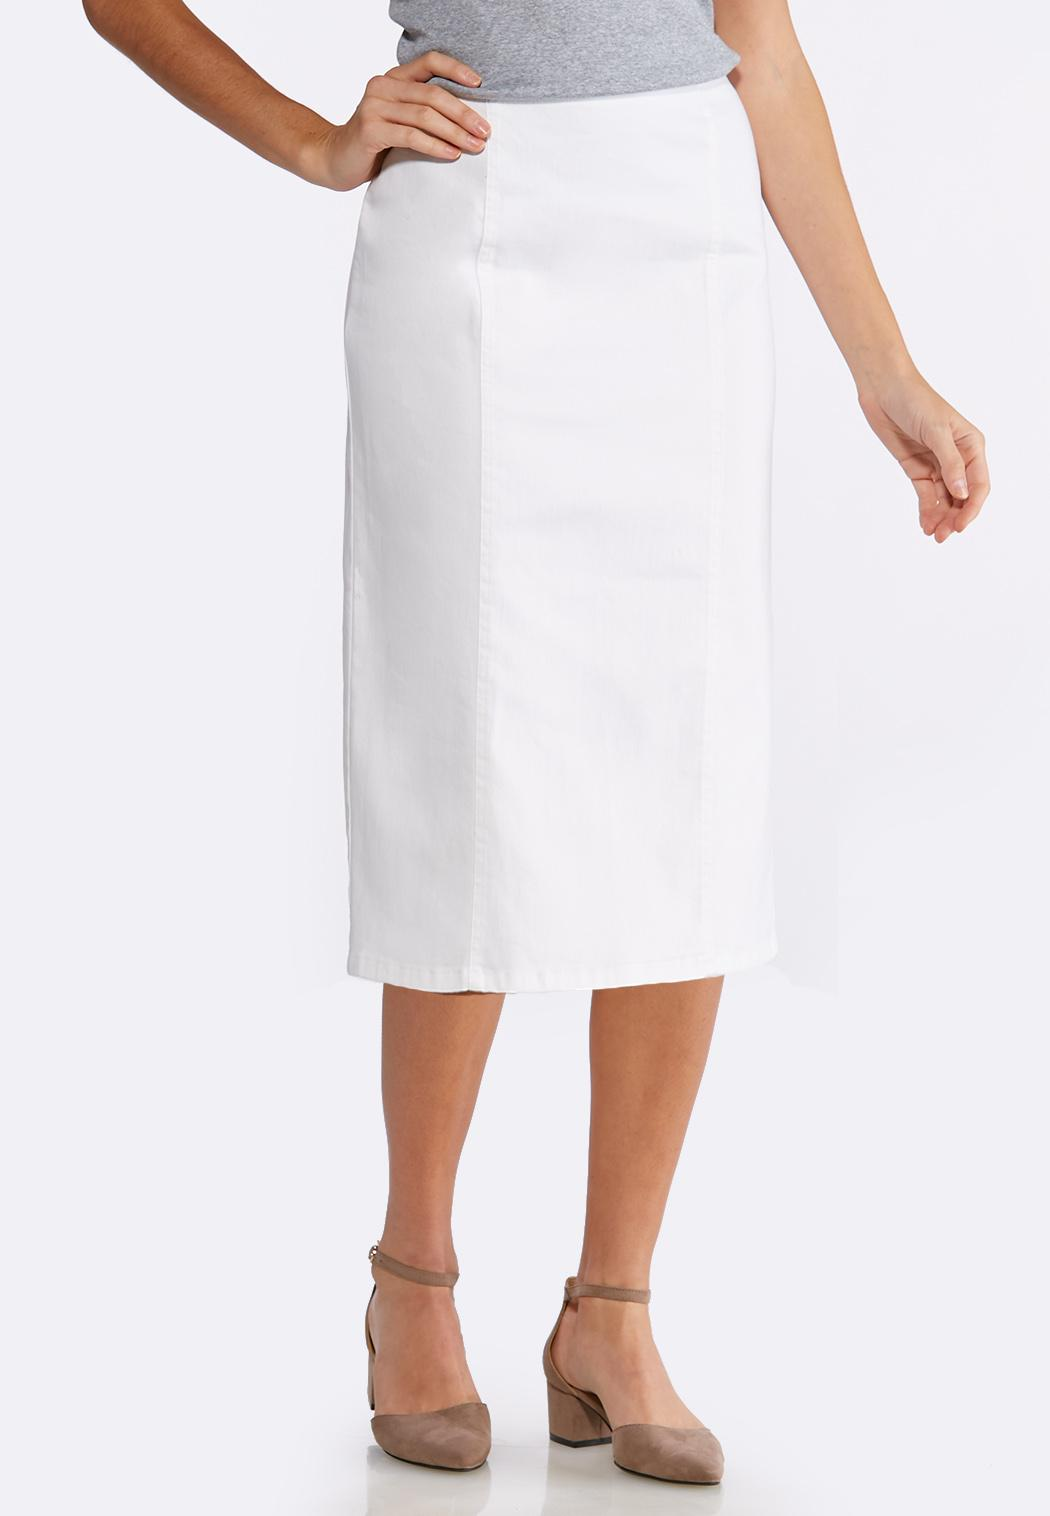 ef552ccb9b Plus Size White Denim Pencil Skirt Skirts Cato Fashions